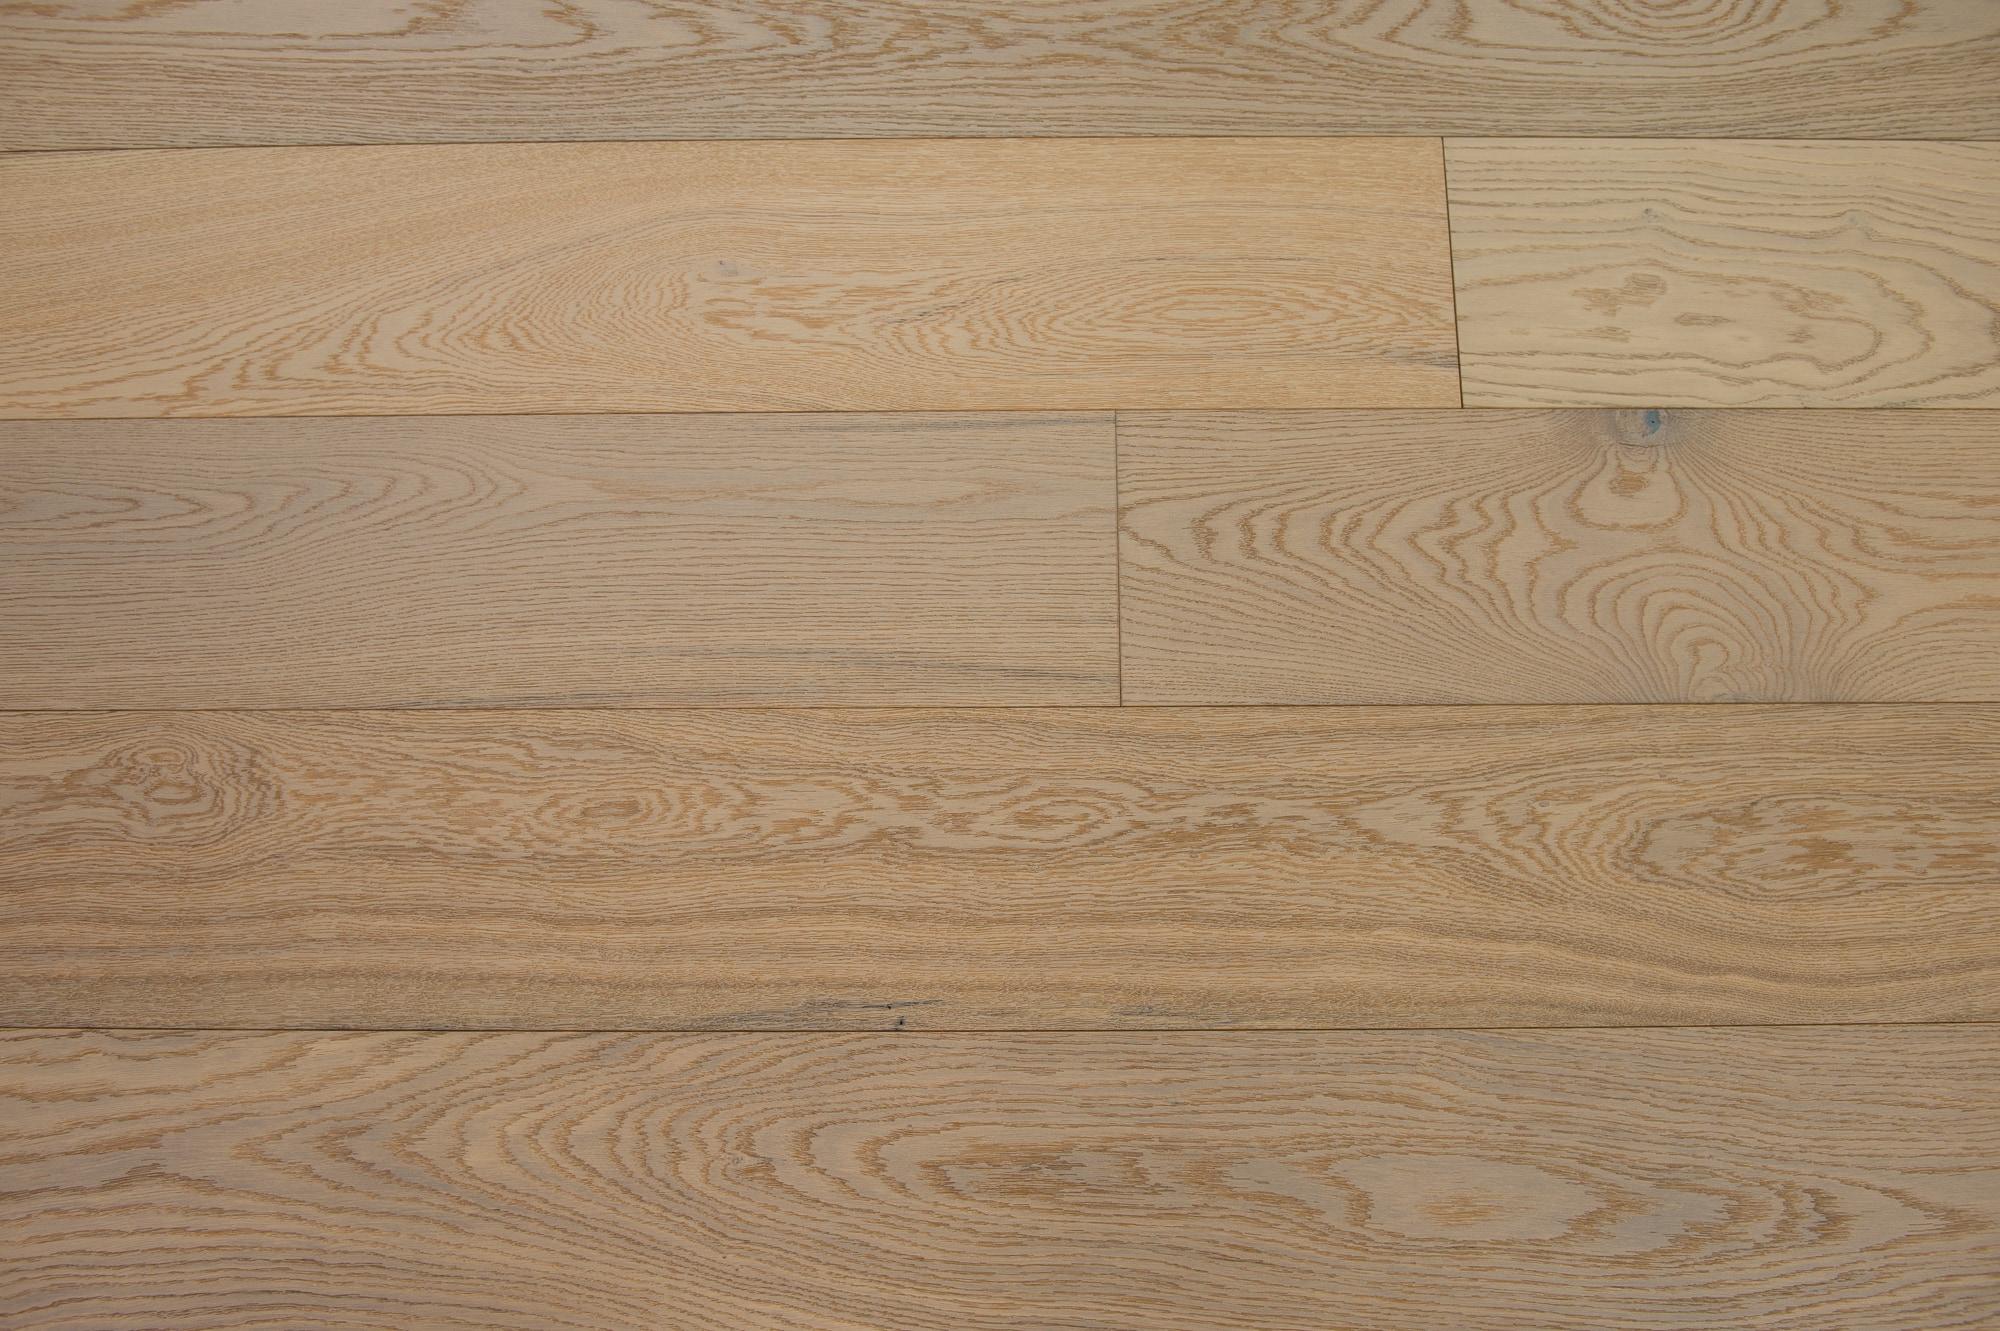 Natural / European White Oak / UV Oil Finish / ABCD / Sample Engineered Hardwood - European White Oak - Denali Collection 0